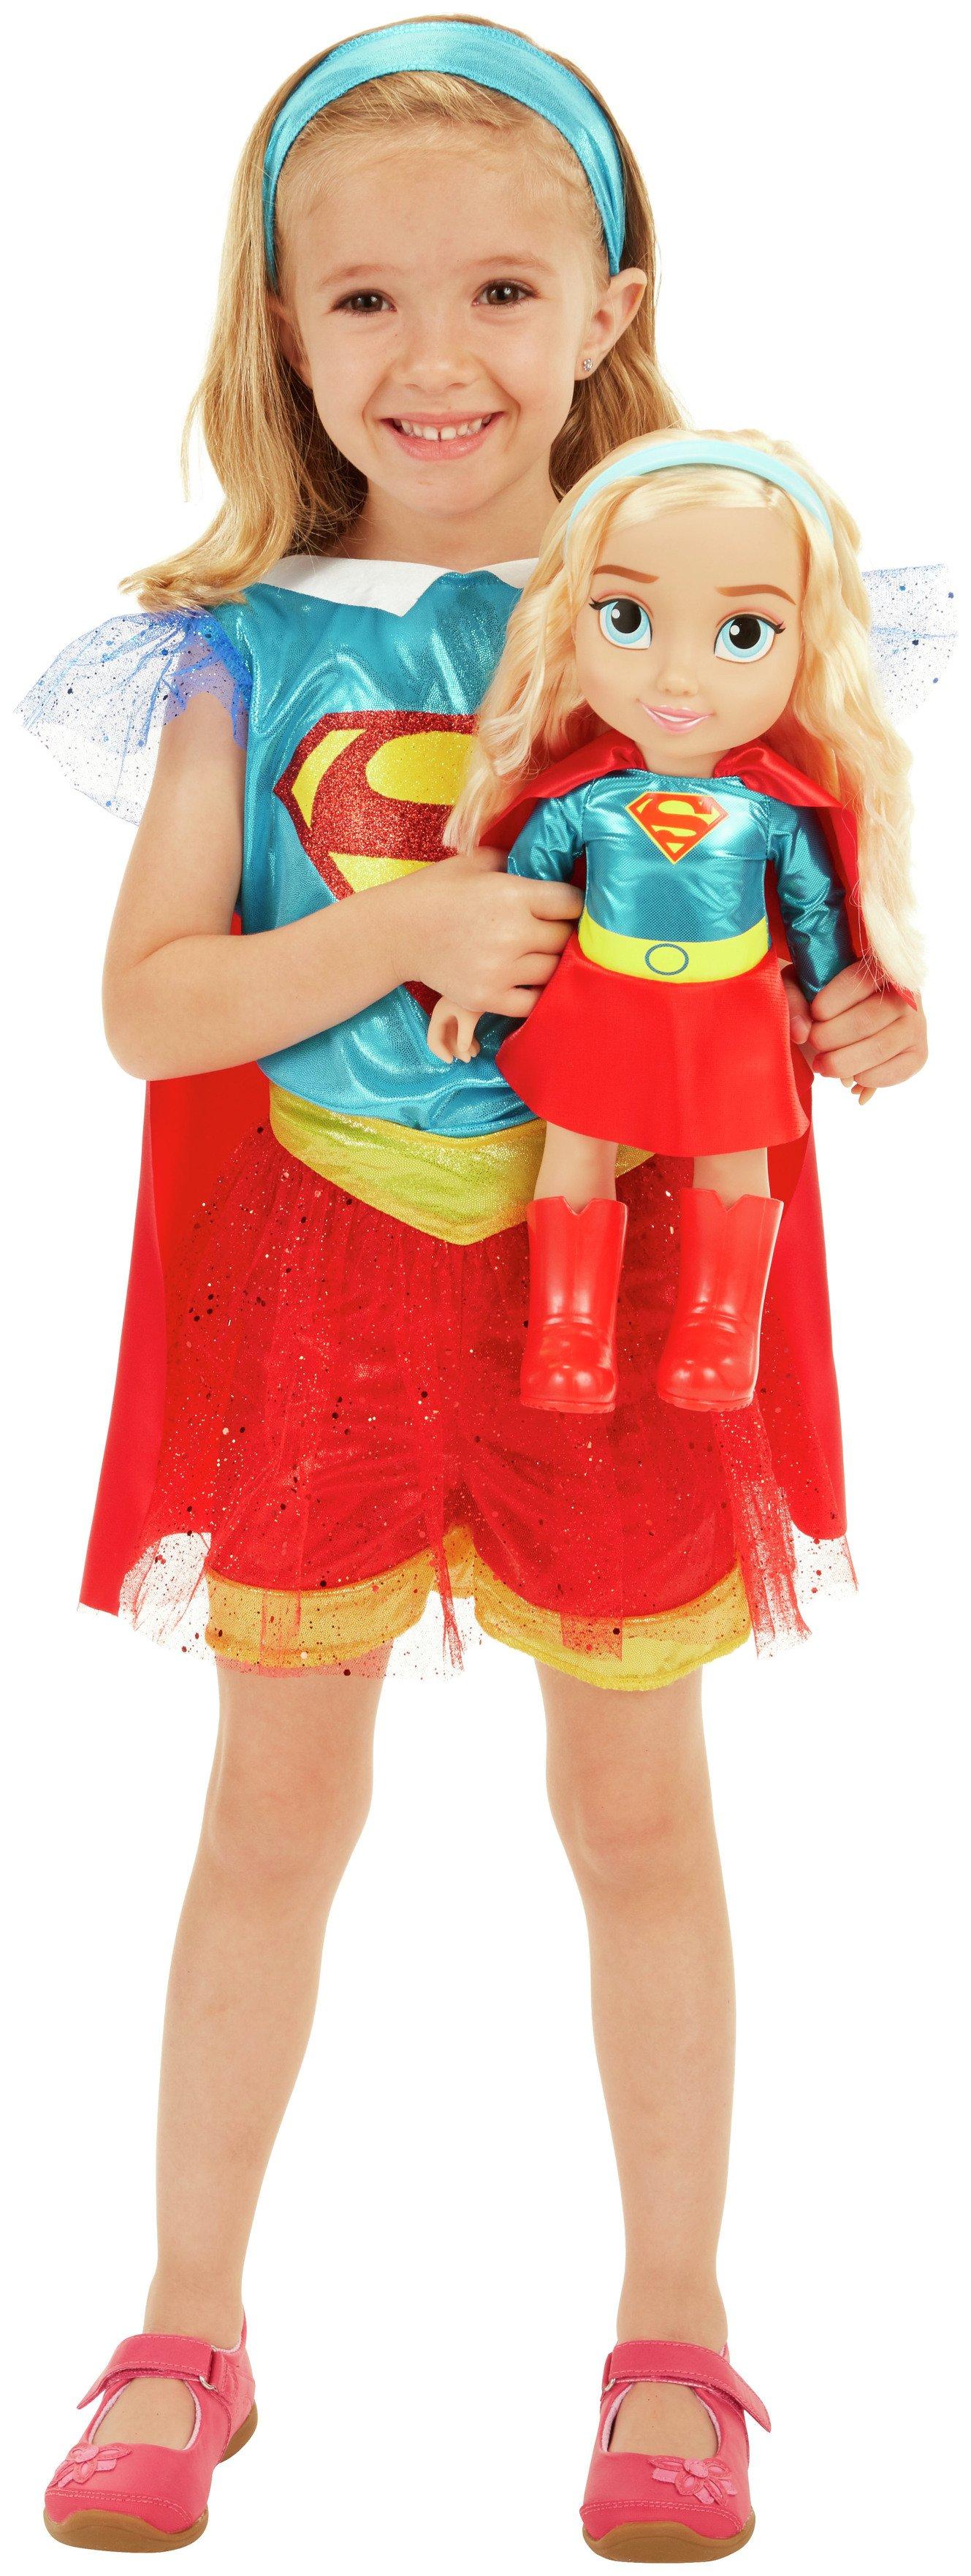 Image of DC Superhero Girls Dolls Assortment